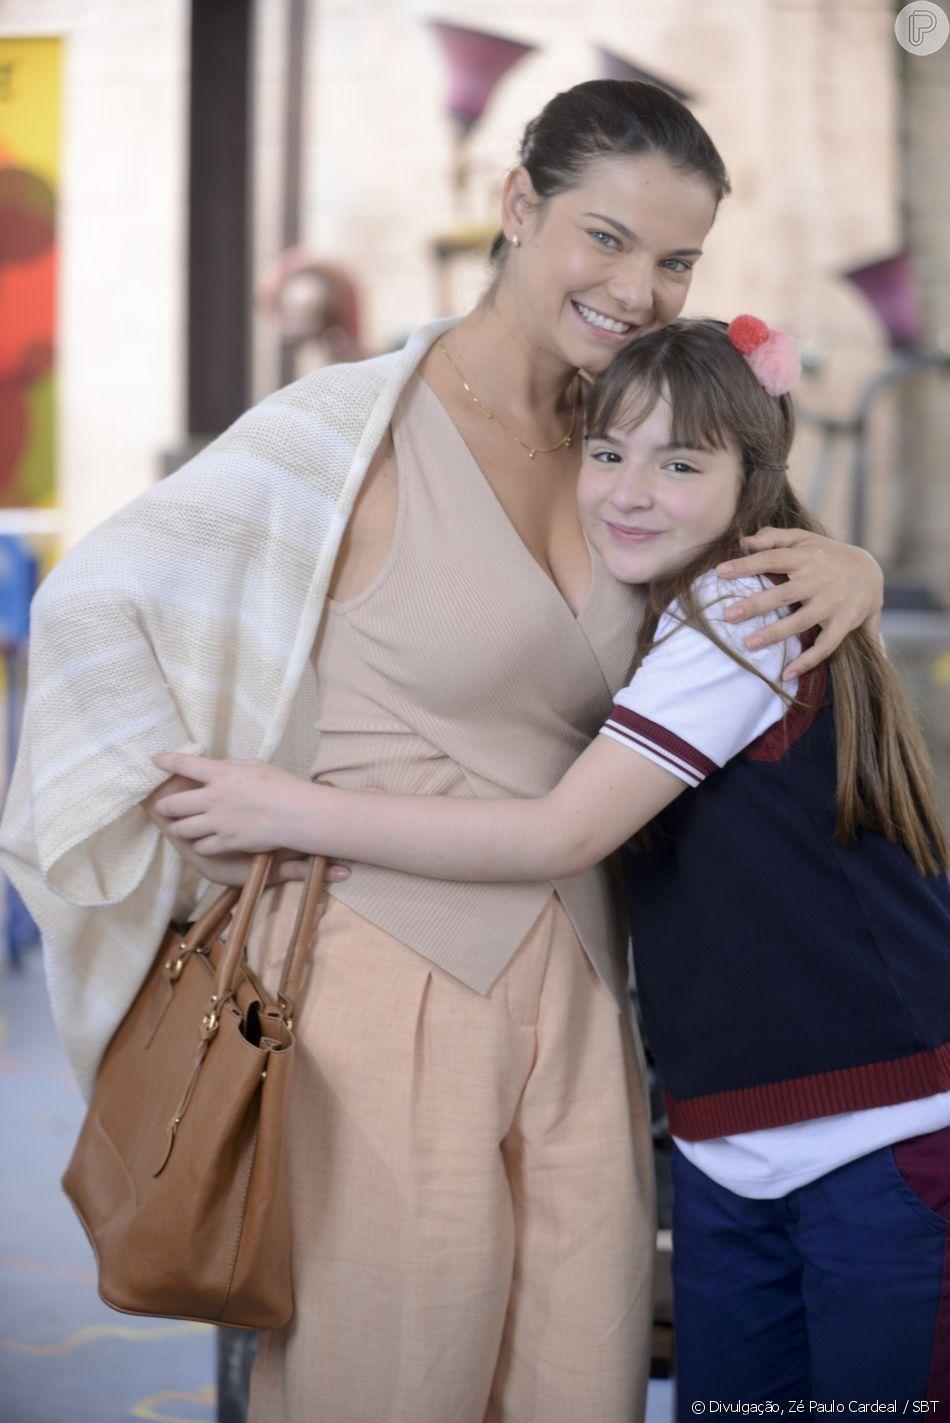 Poliana (Sophia Valverde) comemora ao ser informada por Luísa (Milena Toscano) que vai permanecer no Ruth Goulart, no capítulo que vai ao ar quinta-feira, dia 5 de julho de 2018, na novela 'As Aventuras de Poliana'